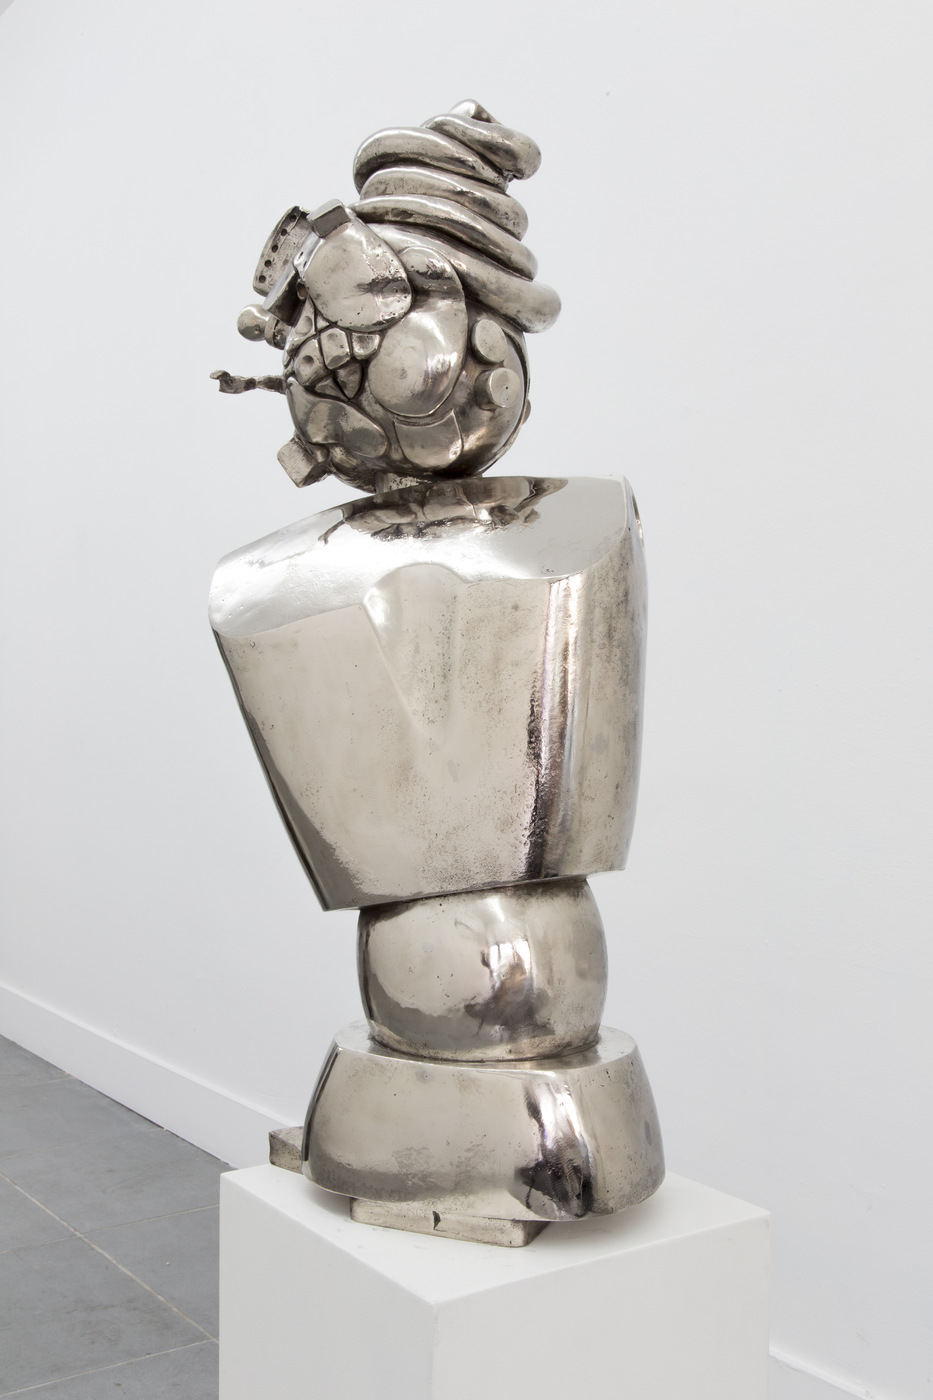 Nadia Naveau, Danoota, 2016, bronze, 84x36x28cm (close-up)